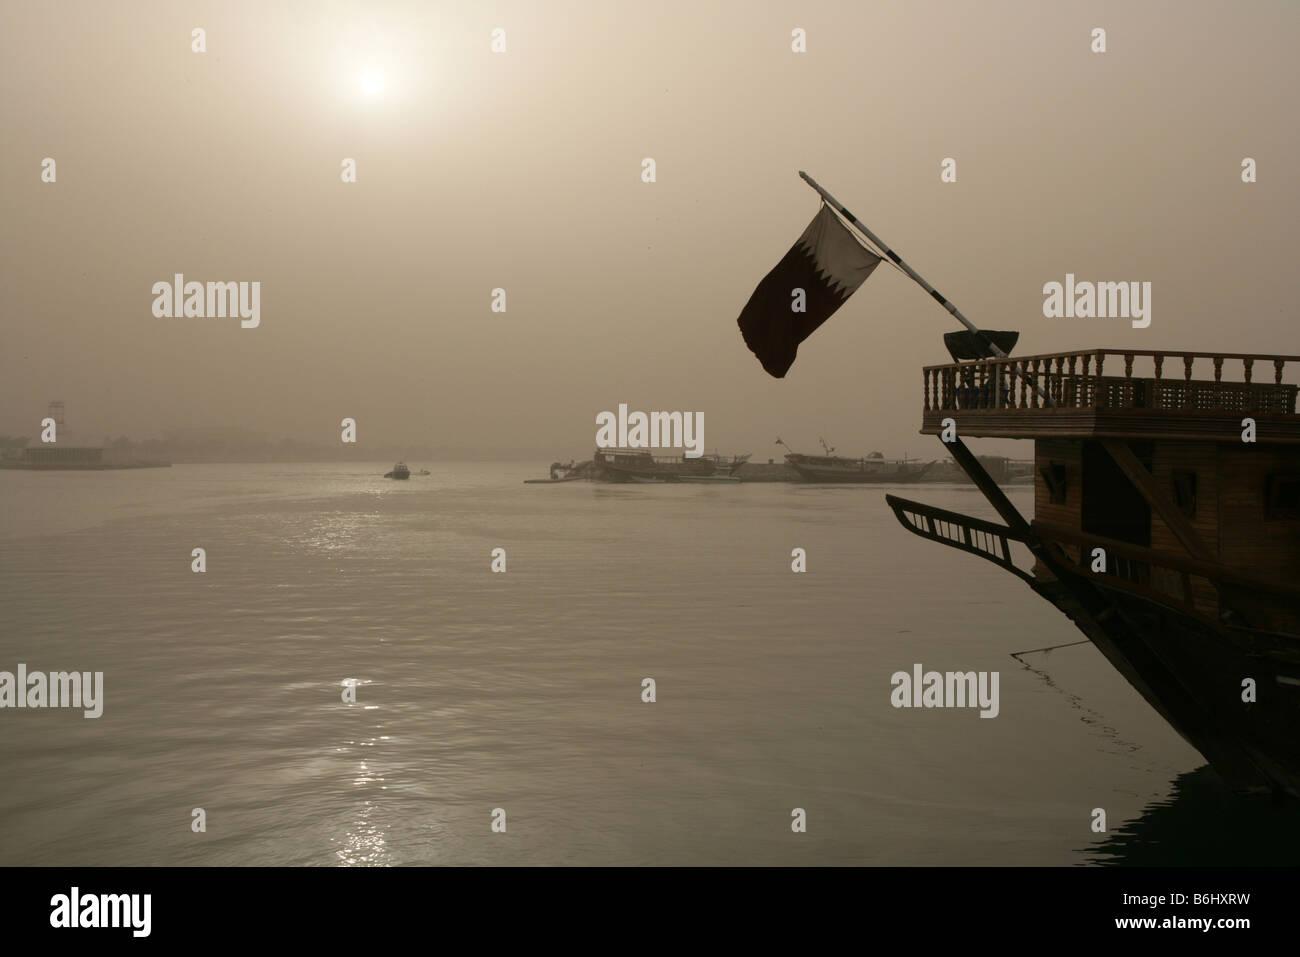 Qatari flag on traditional boat in sunlit haze, Doha Bay,Doha, Qatar, Middle East Stock Photo